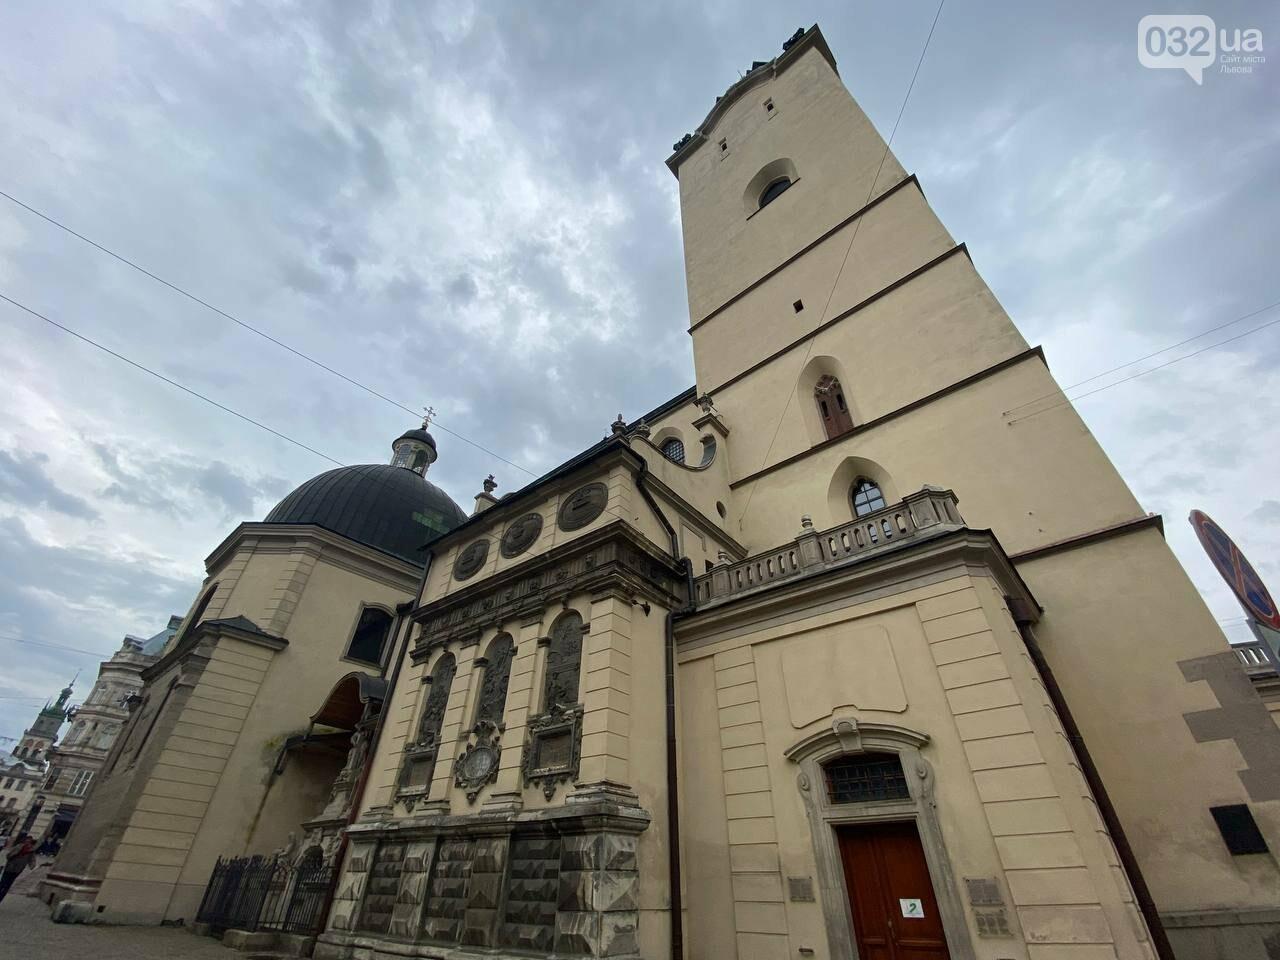 Латинський кафедральний собор, Фото: 032.ua